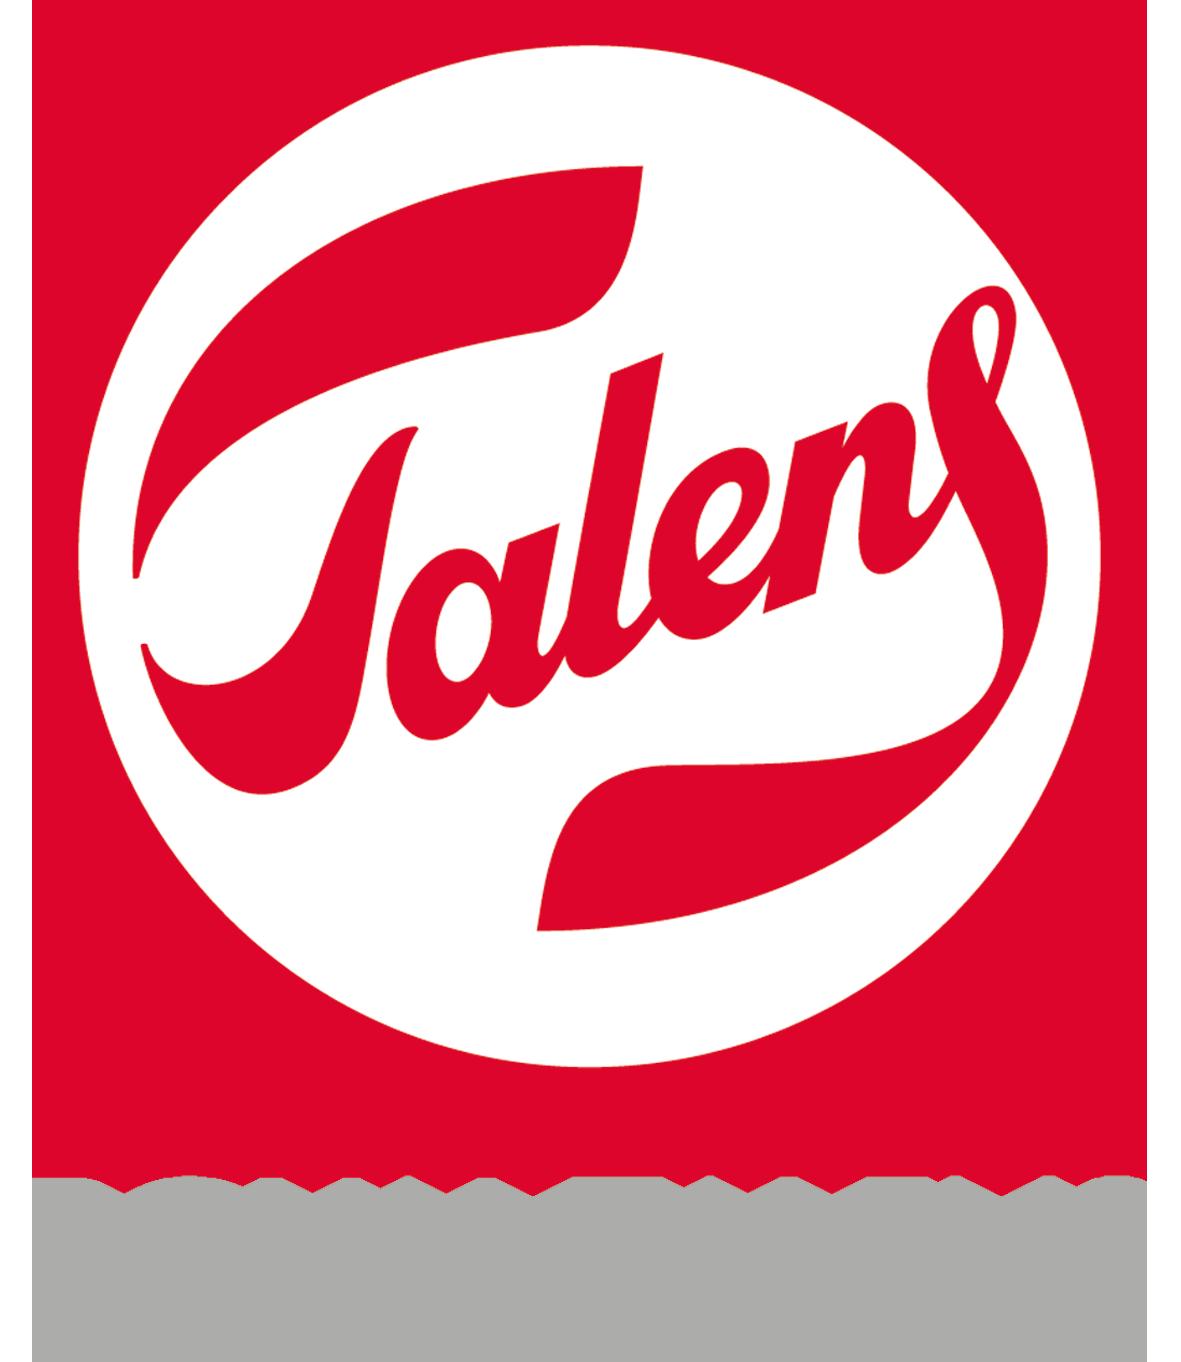 RoyalTalens_small-logo_PMS-no-space